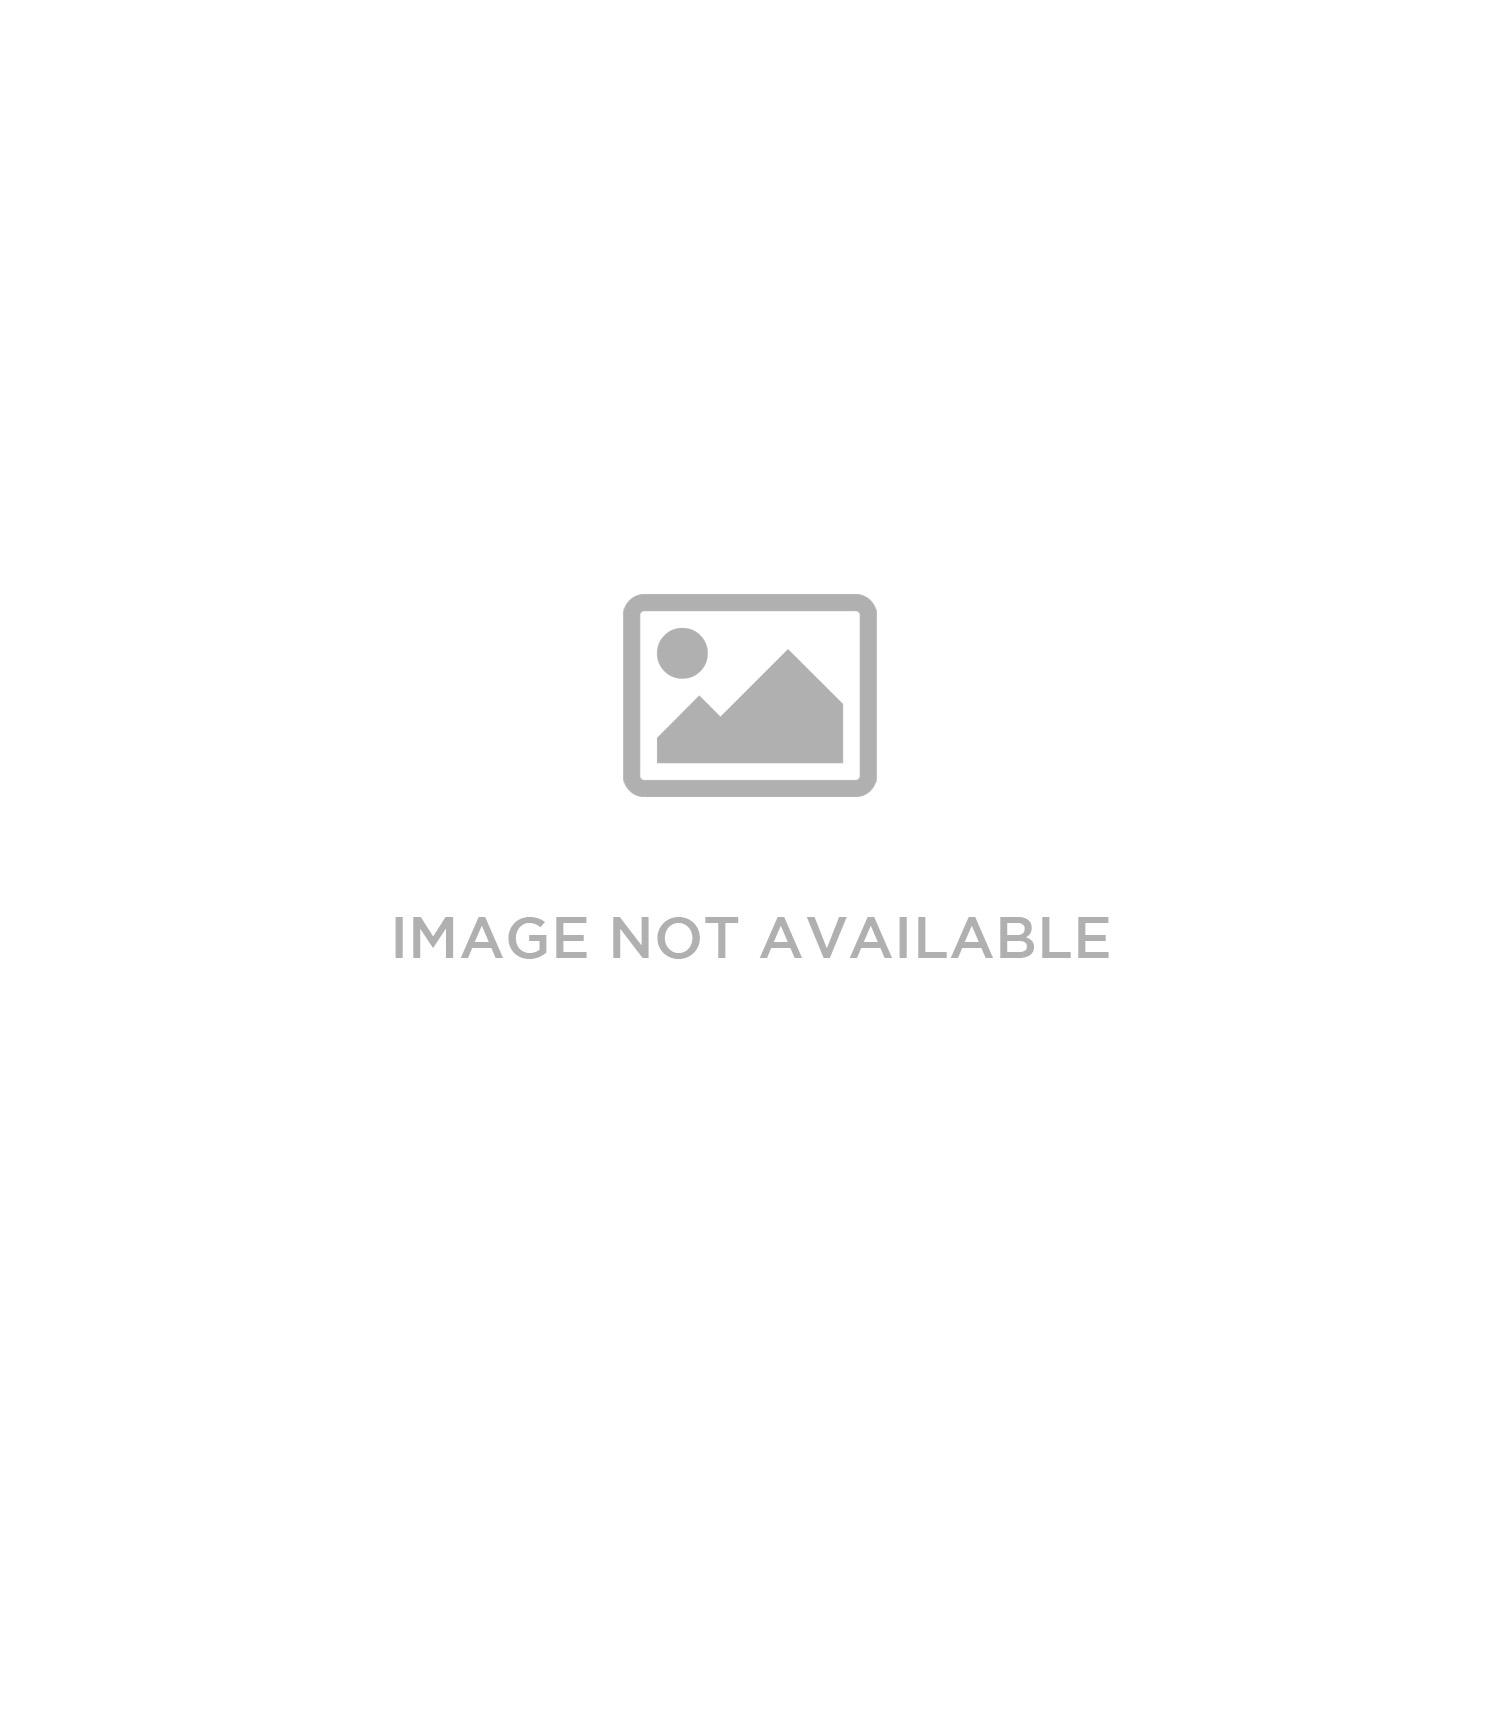 6f9db88f5 DISCONTINUED EDDIE BAUER® MICRO FLEECE FULL ZIP LADIES' JACKET ...